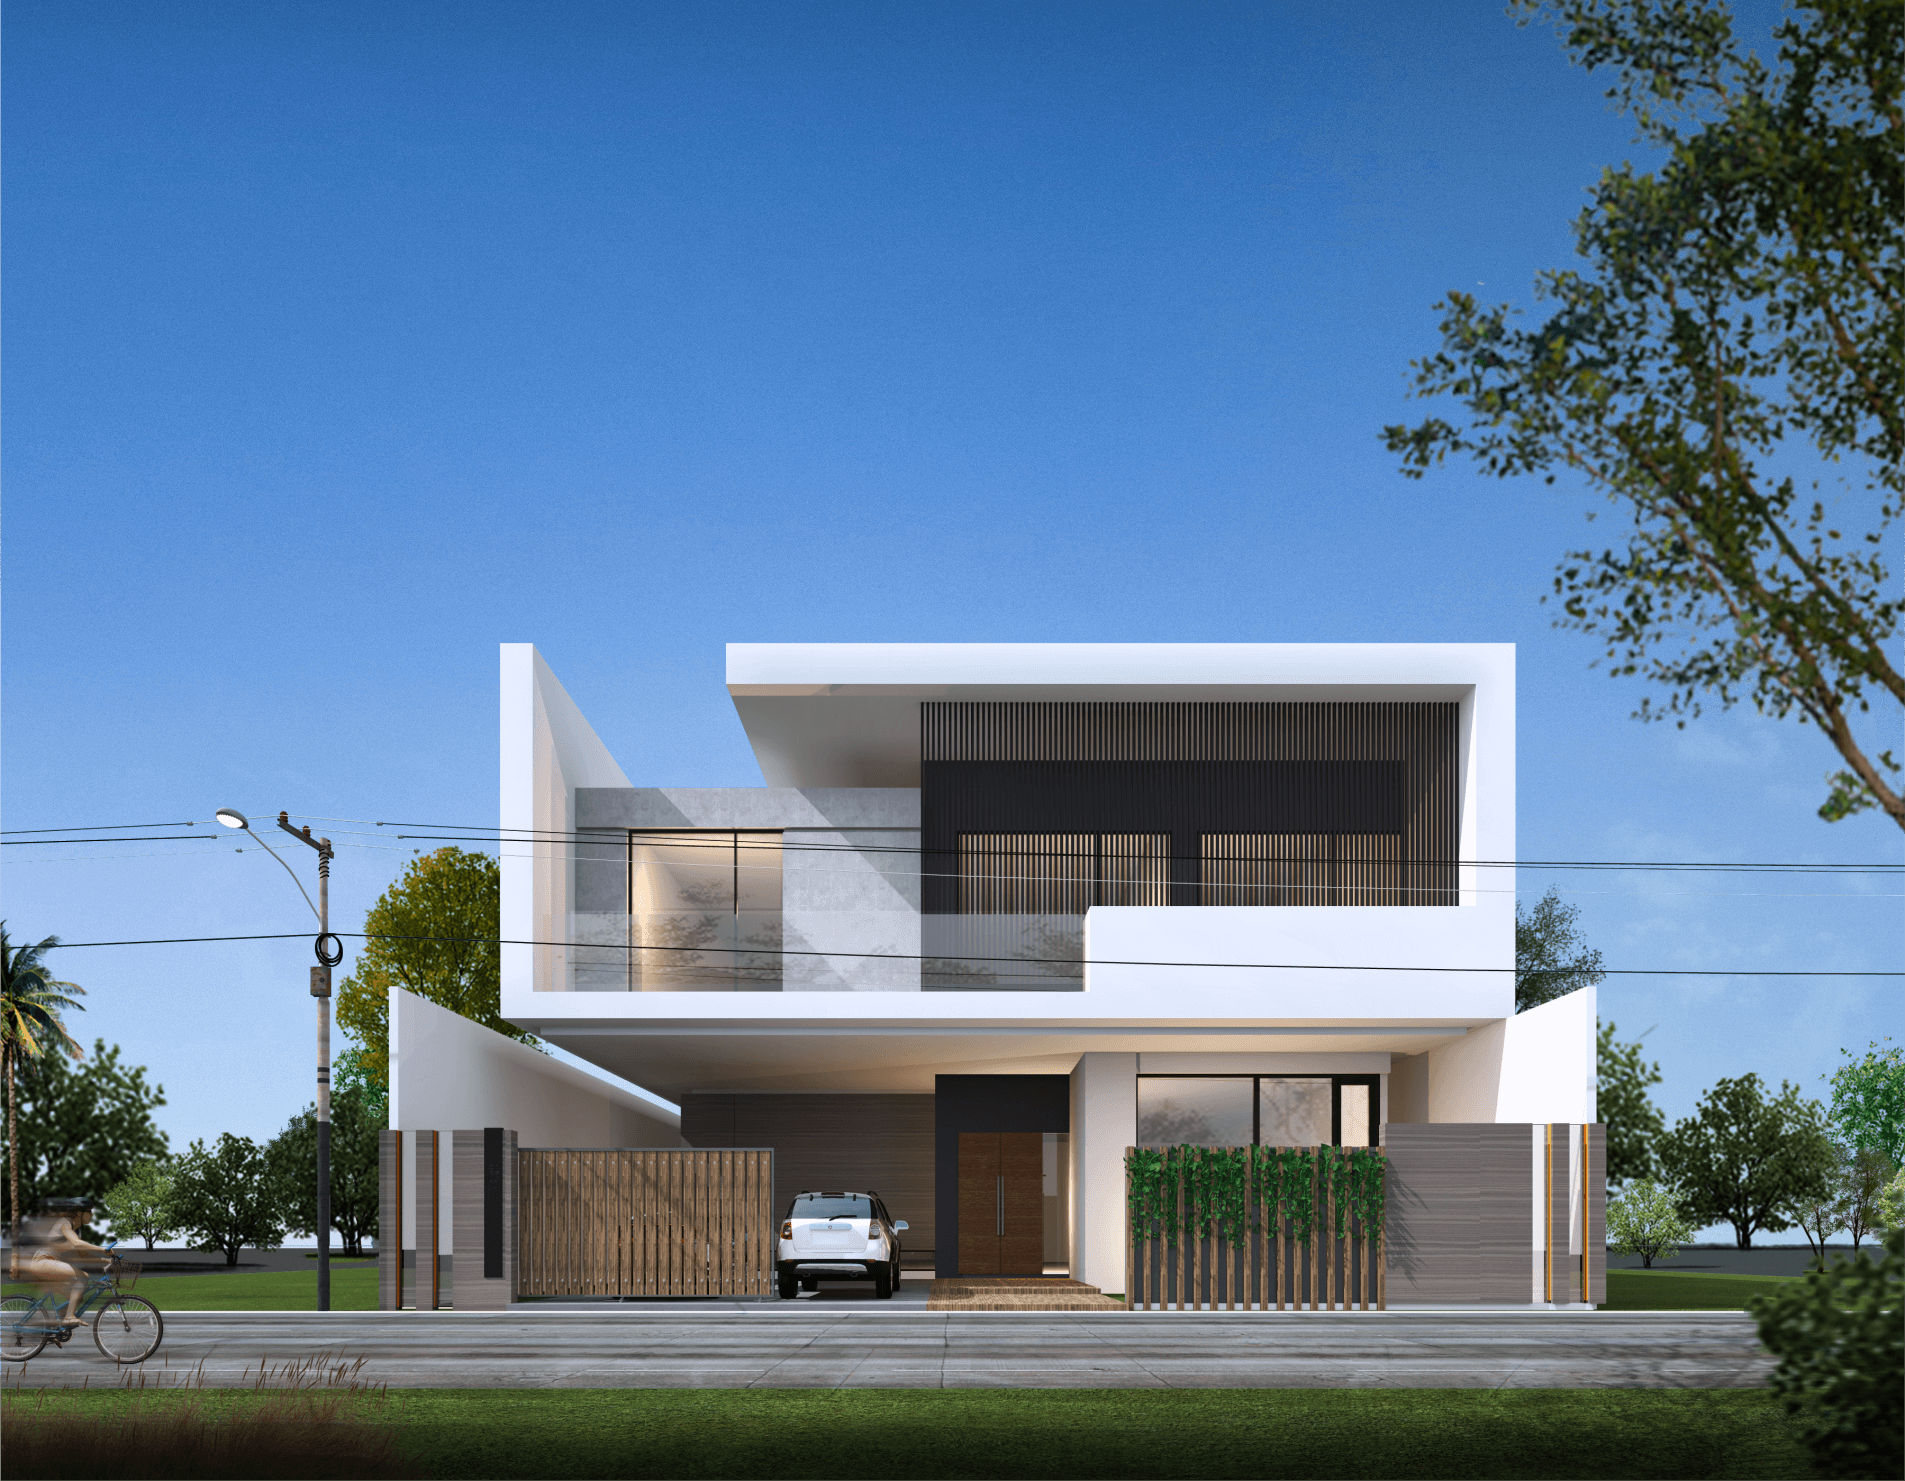 Atelier Baou Jb 2 House Batam, Kota Batam, Kepulauan Riau, Indonesia Batam, Kota Batam, Kepulauan Riau, Indonesia Atelier-Baou-Jb-2-House  86498